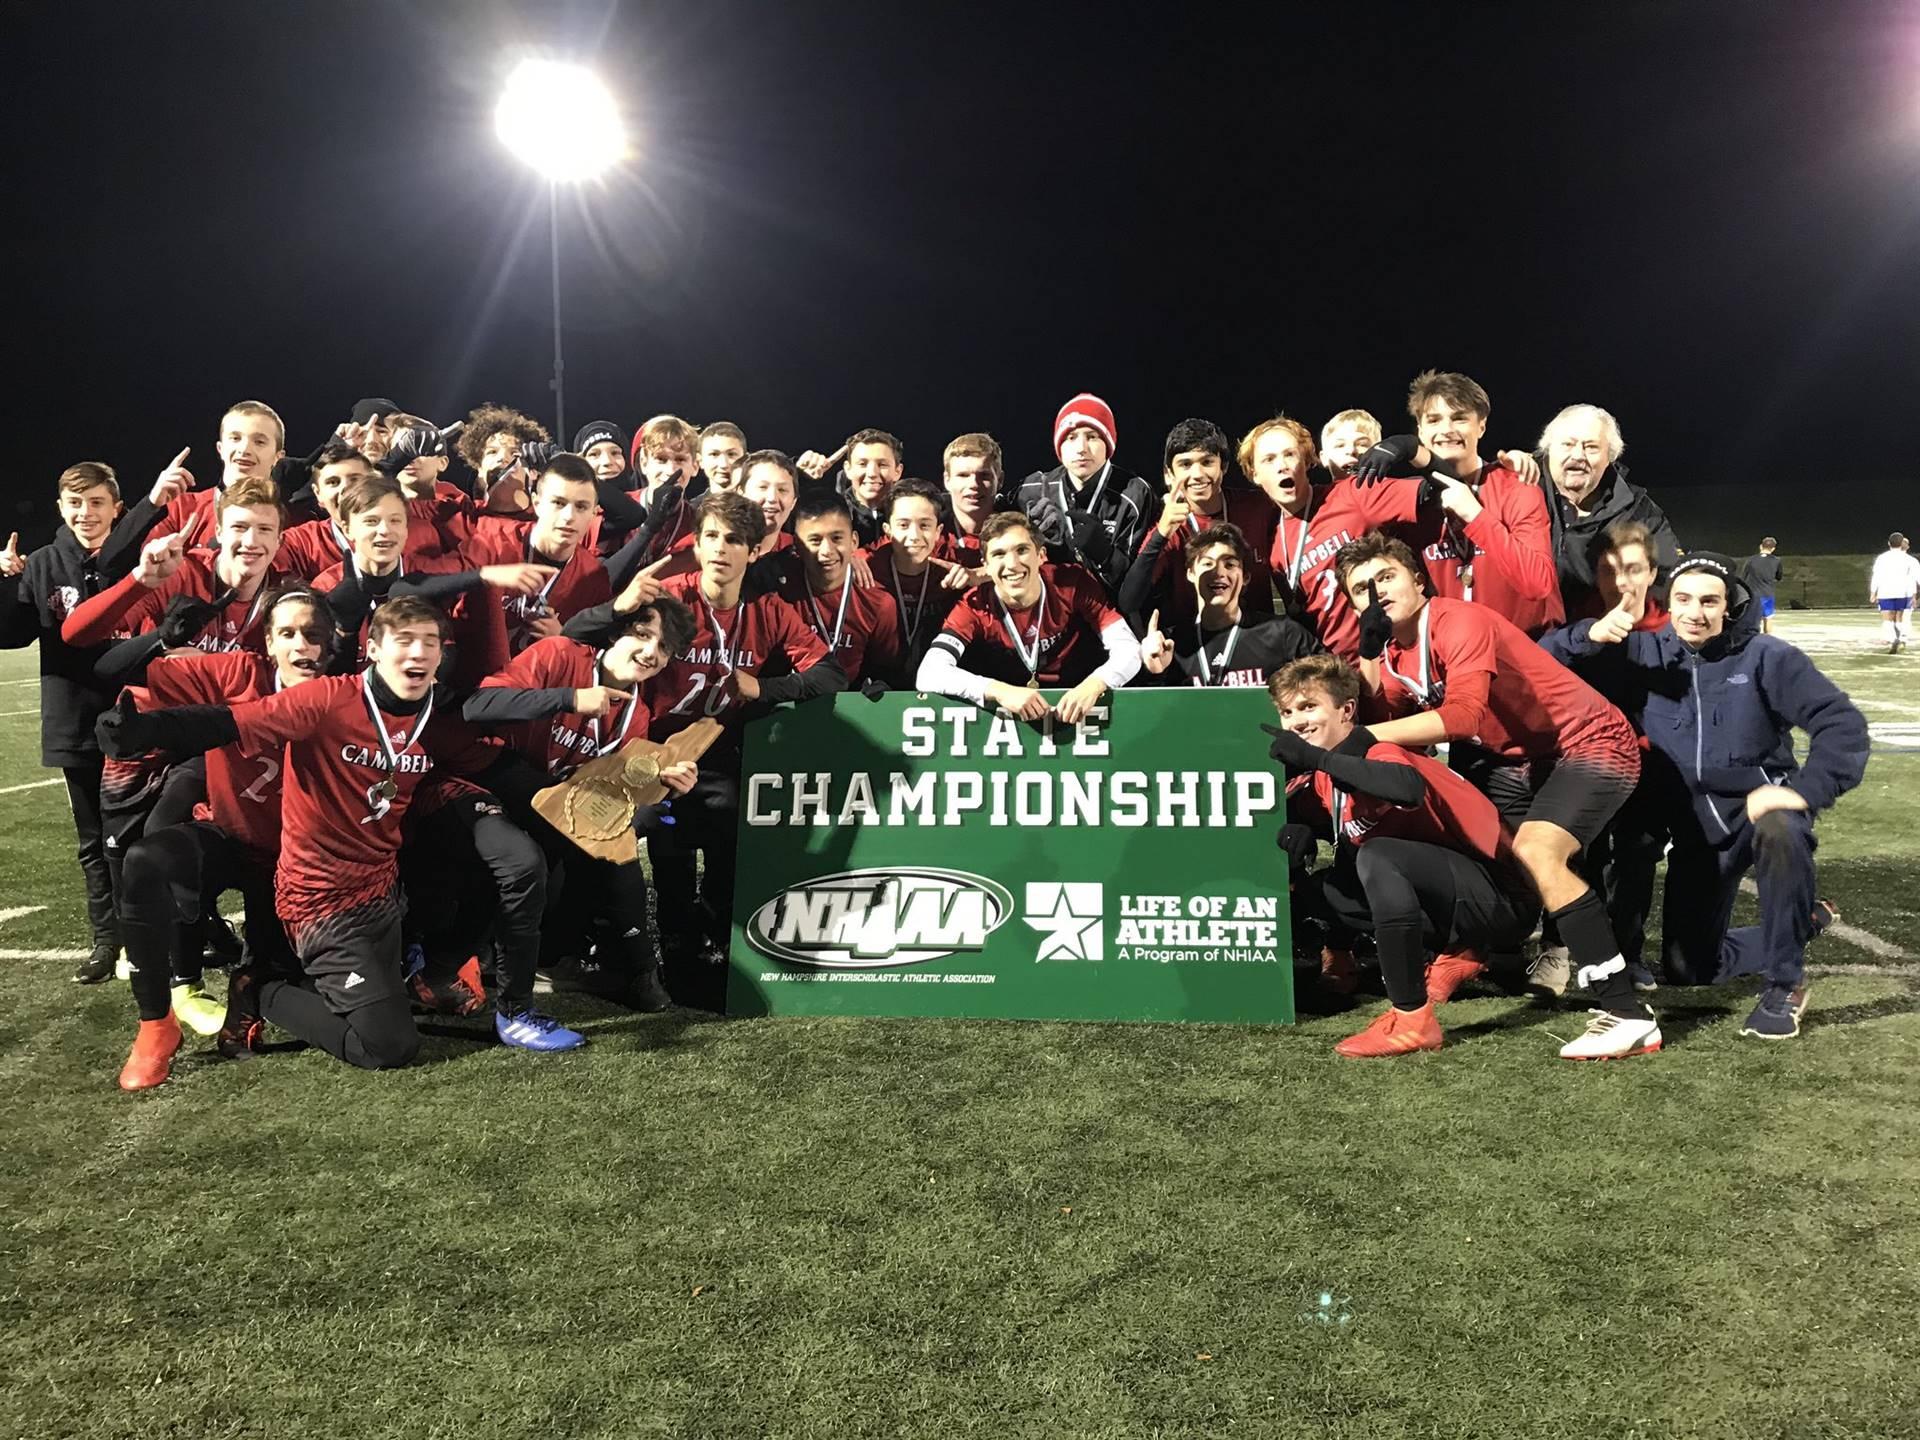 2019 NHIAA Division III Boys Soccer Champions!